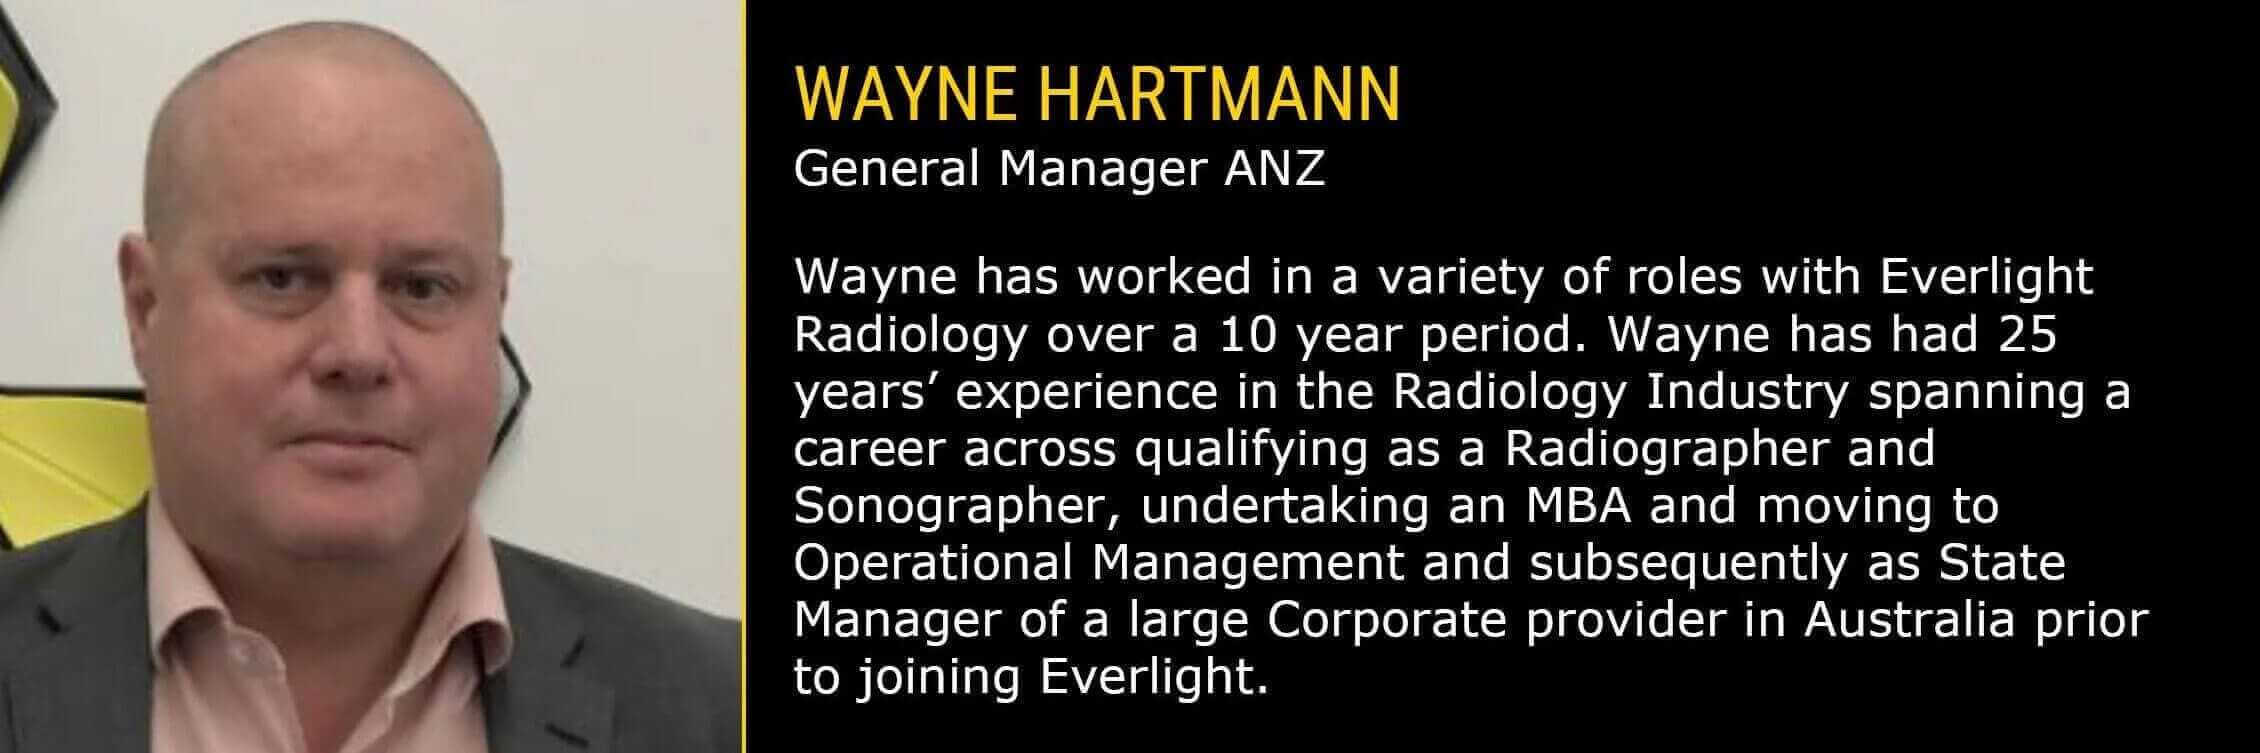 Wayne Hartman bio image